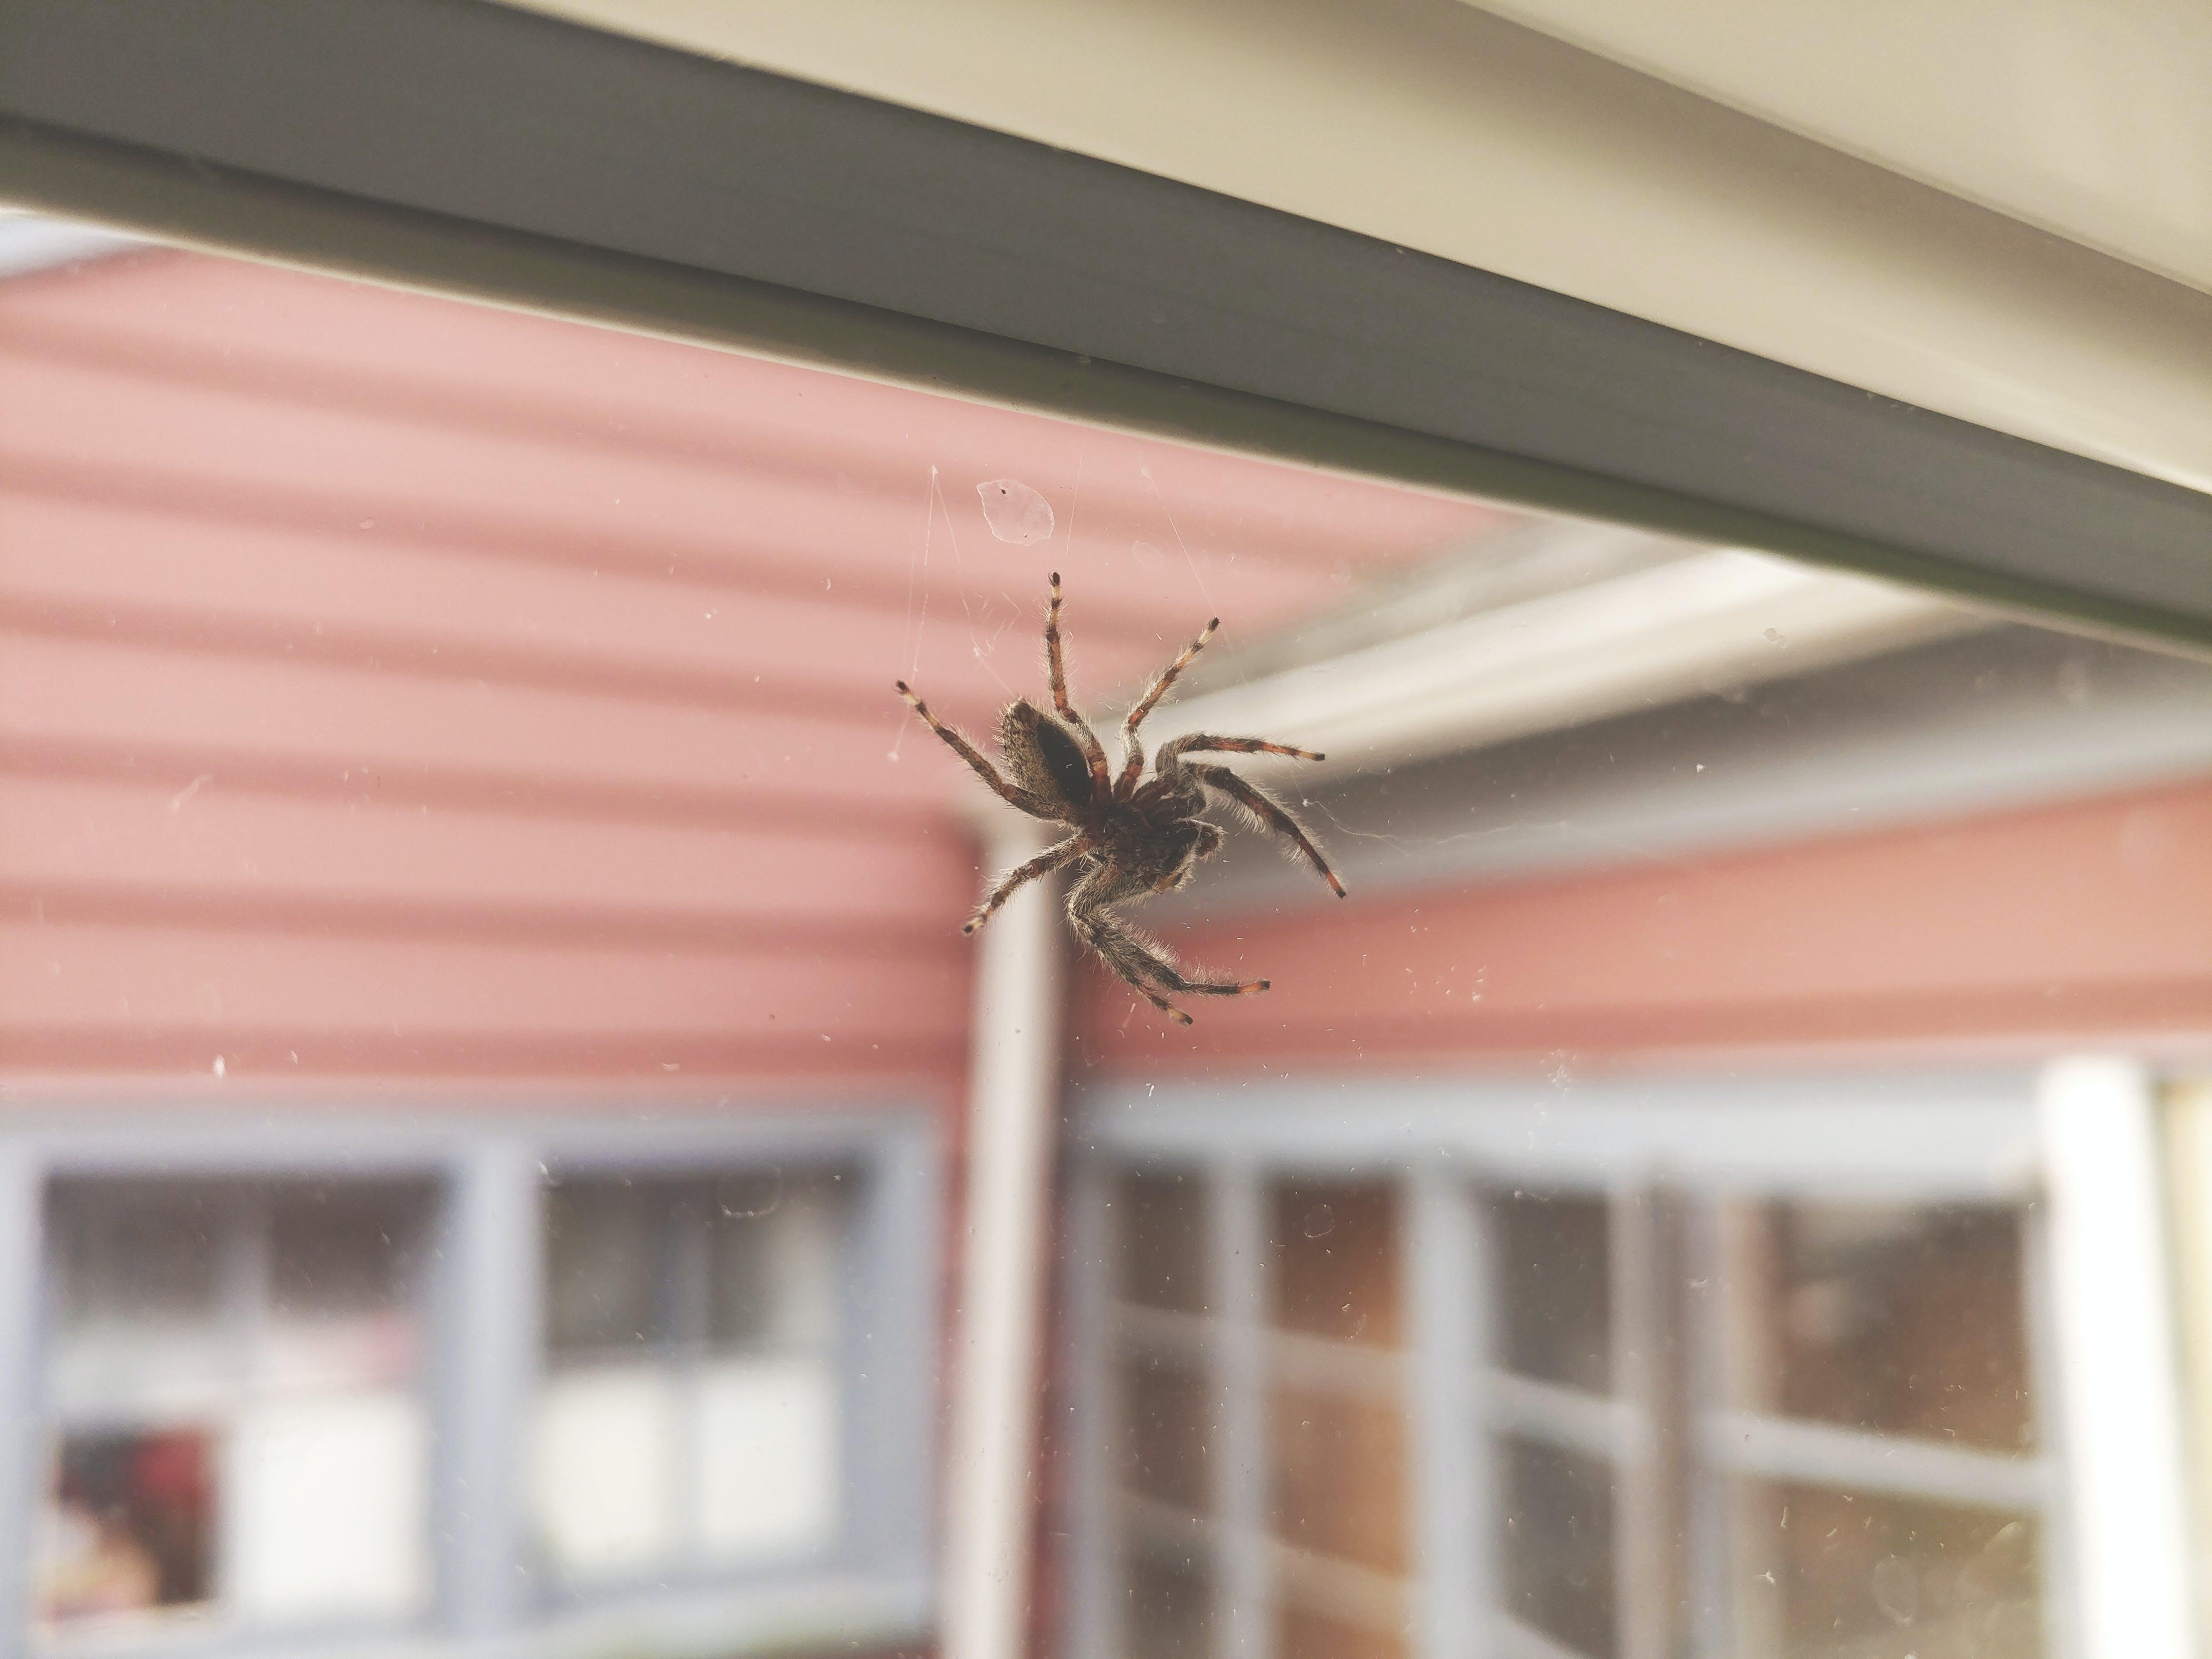 Free stock photo of arachnid, destroir, destroirphotography, jump